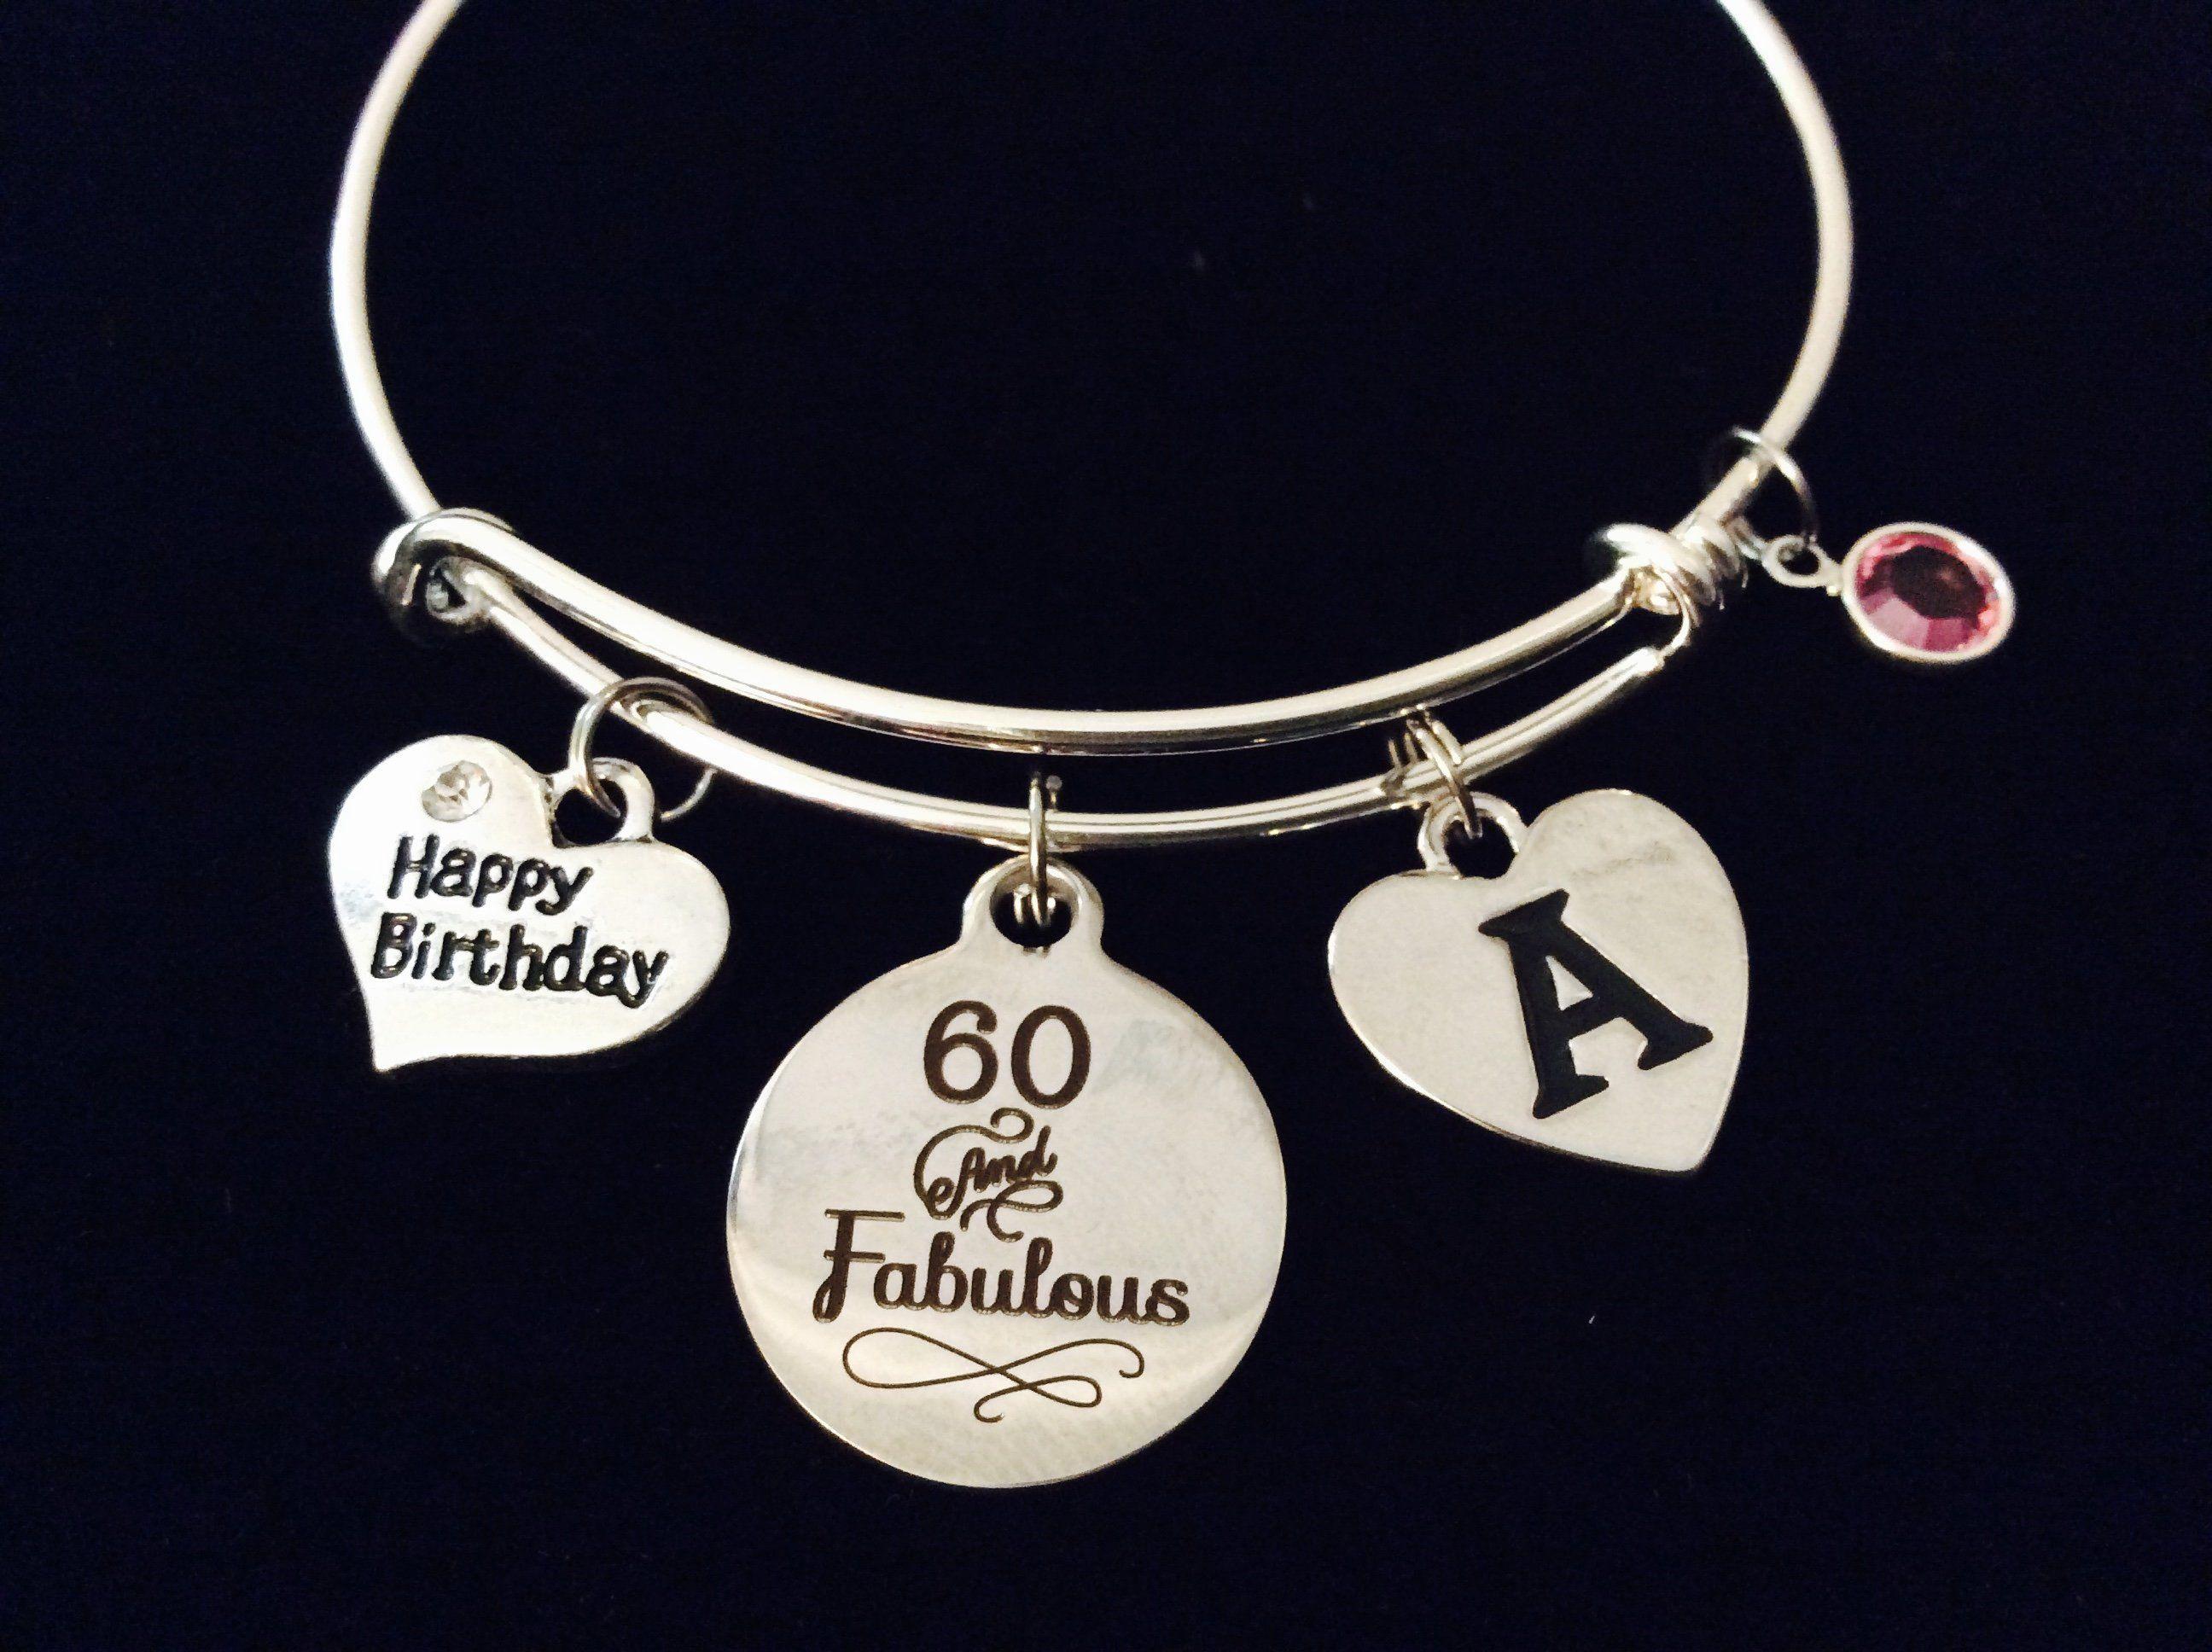 60th Birthday charm pin 60